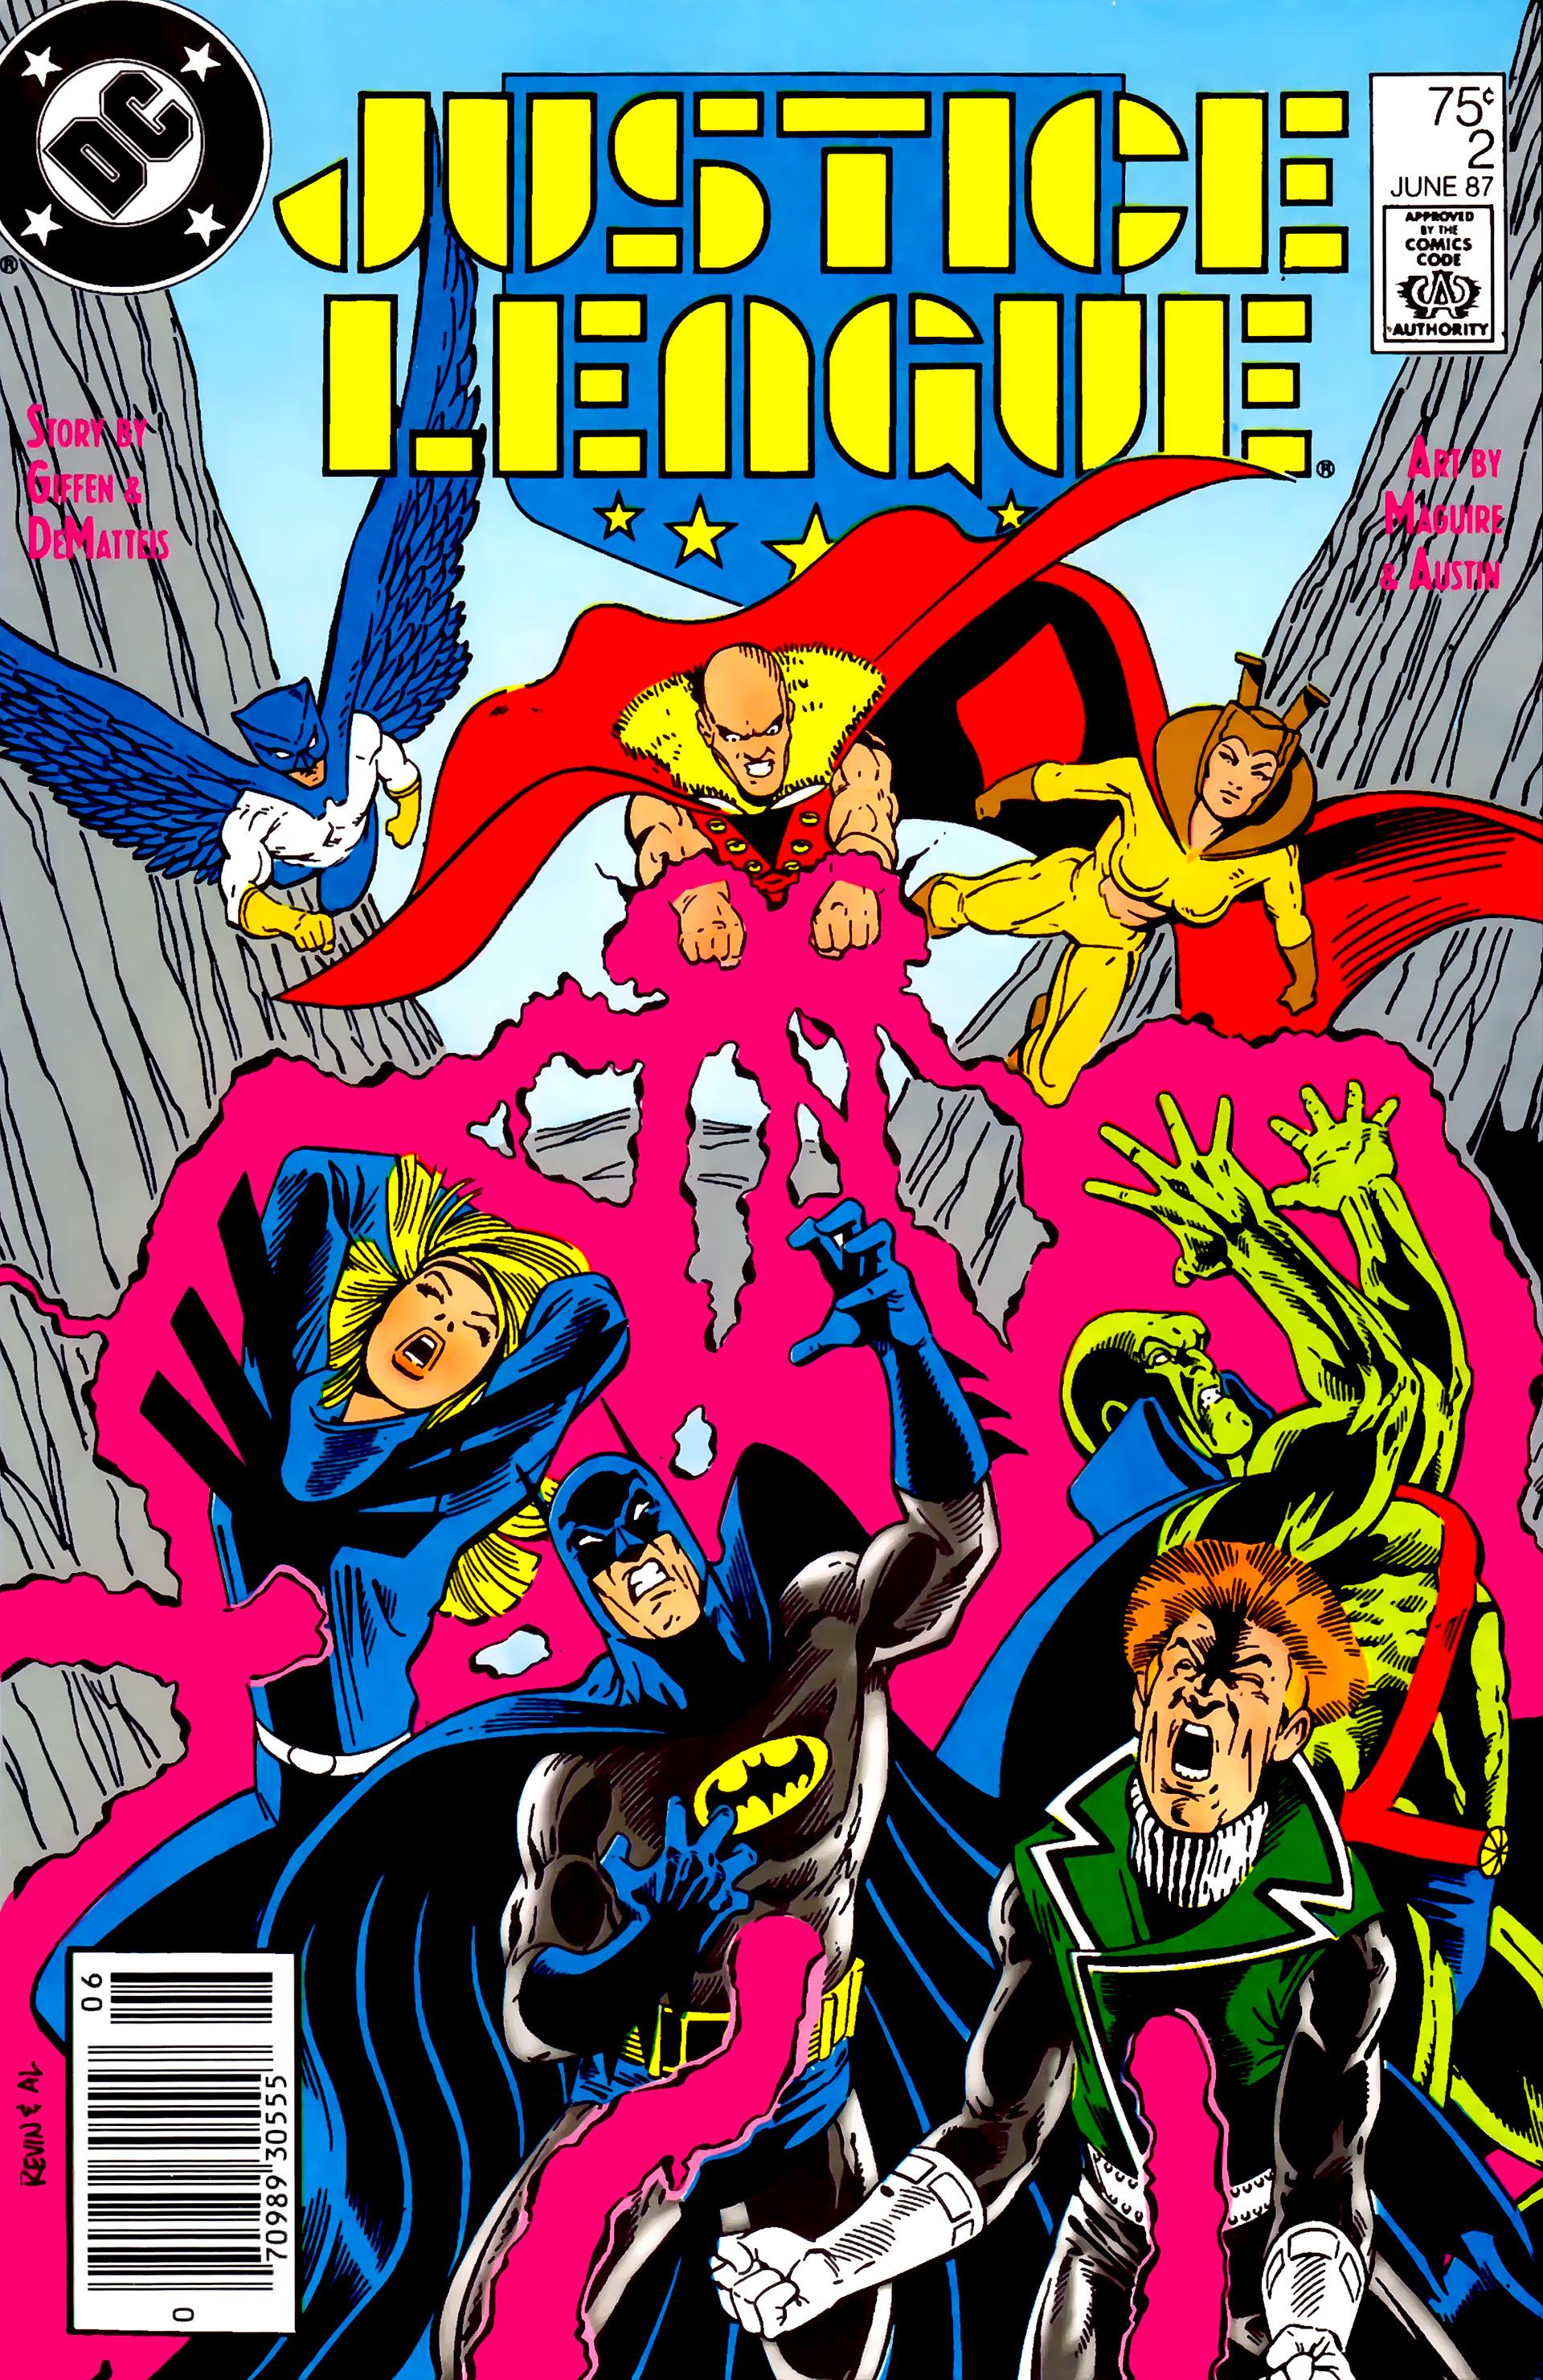 Justice League (1987) 2 Page 1